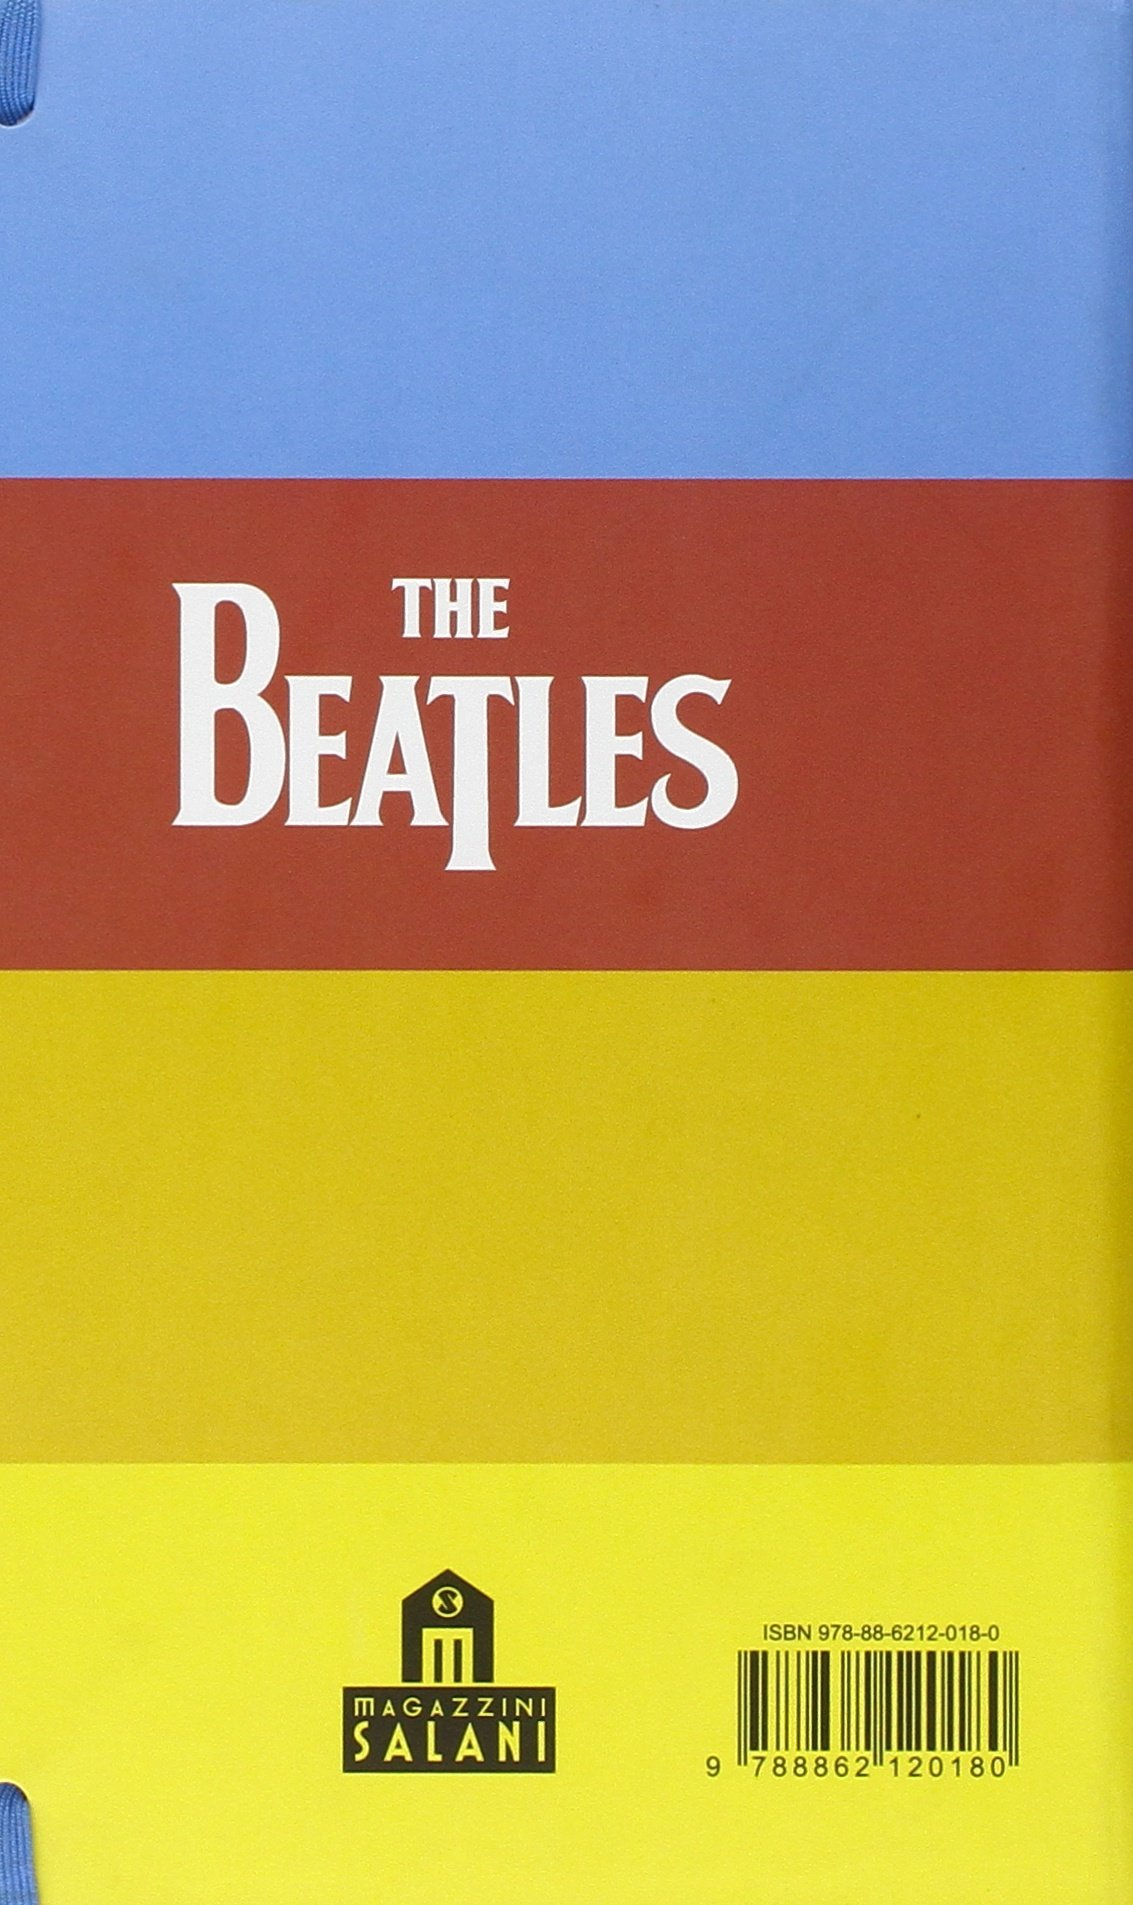 The Beatles. Agenda 2008: 9788862120180: Amazon.com: Books